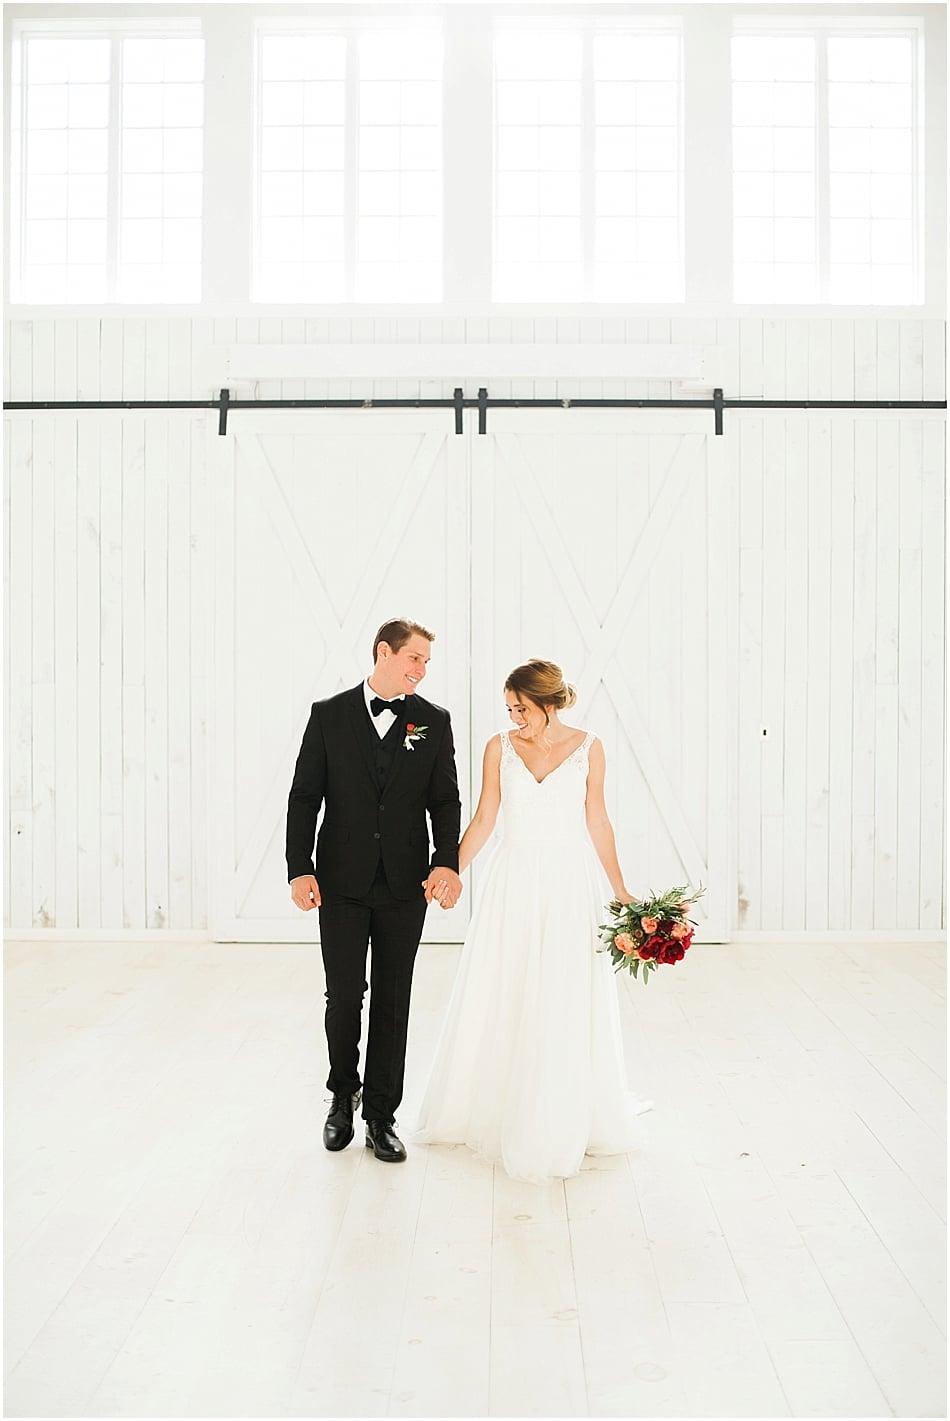 Emilie Anne Photography | White Sparrow Barn | Editorial Shoot | Film_-18.jpg